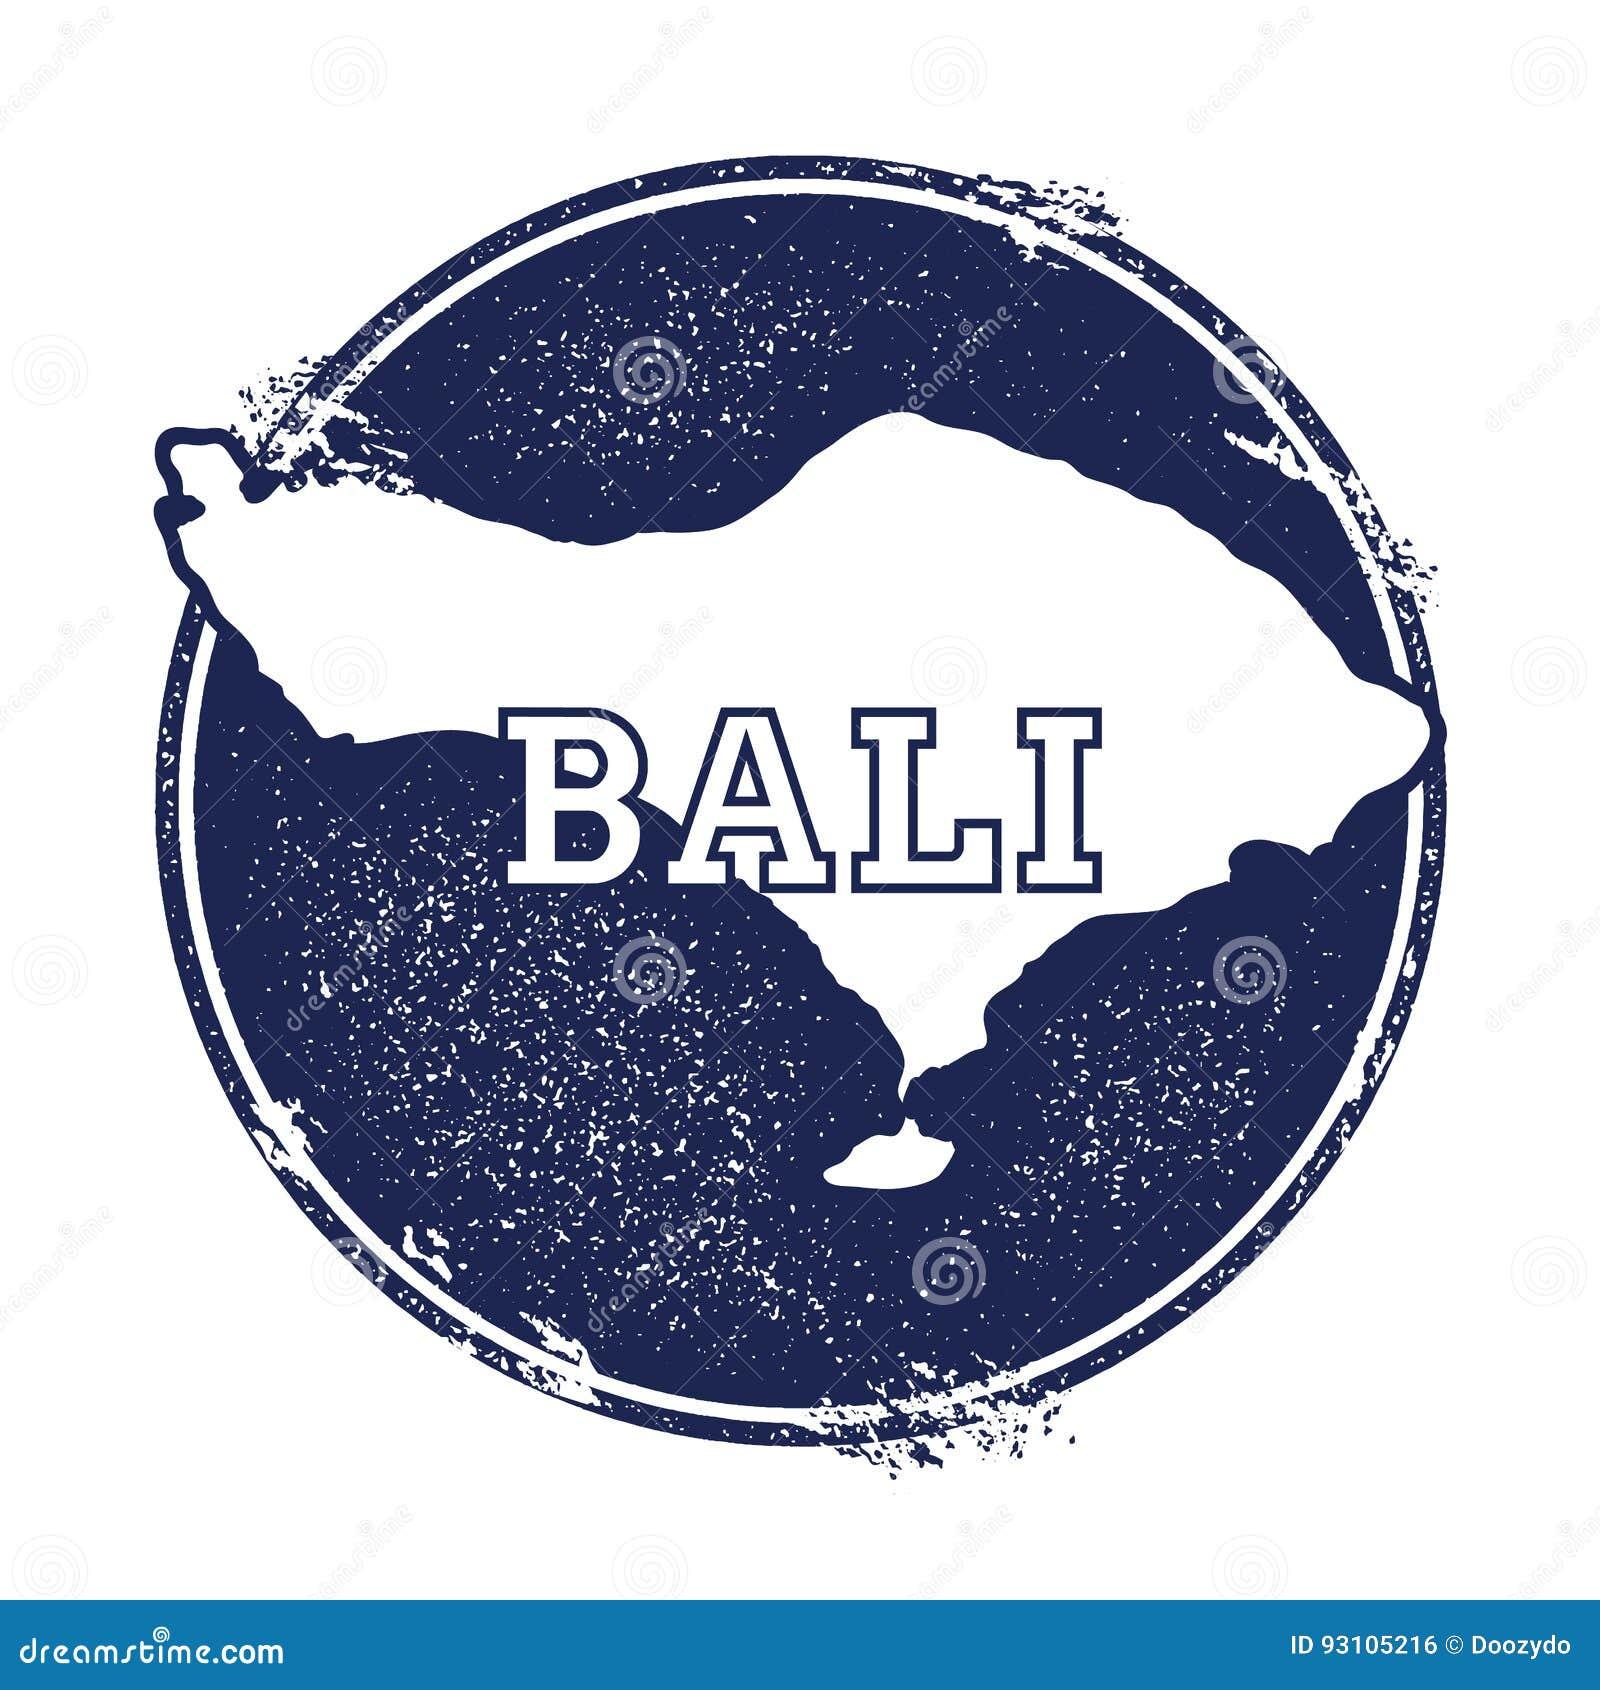 Bali Vector Map Stock Vector Illustration Of Badge 93105216